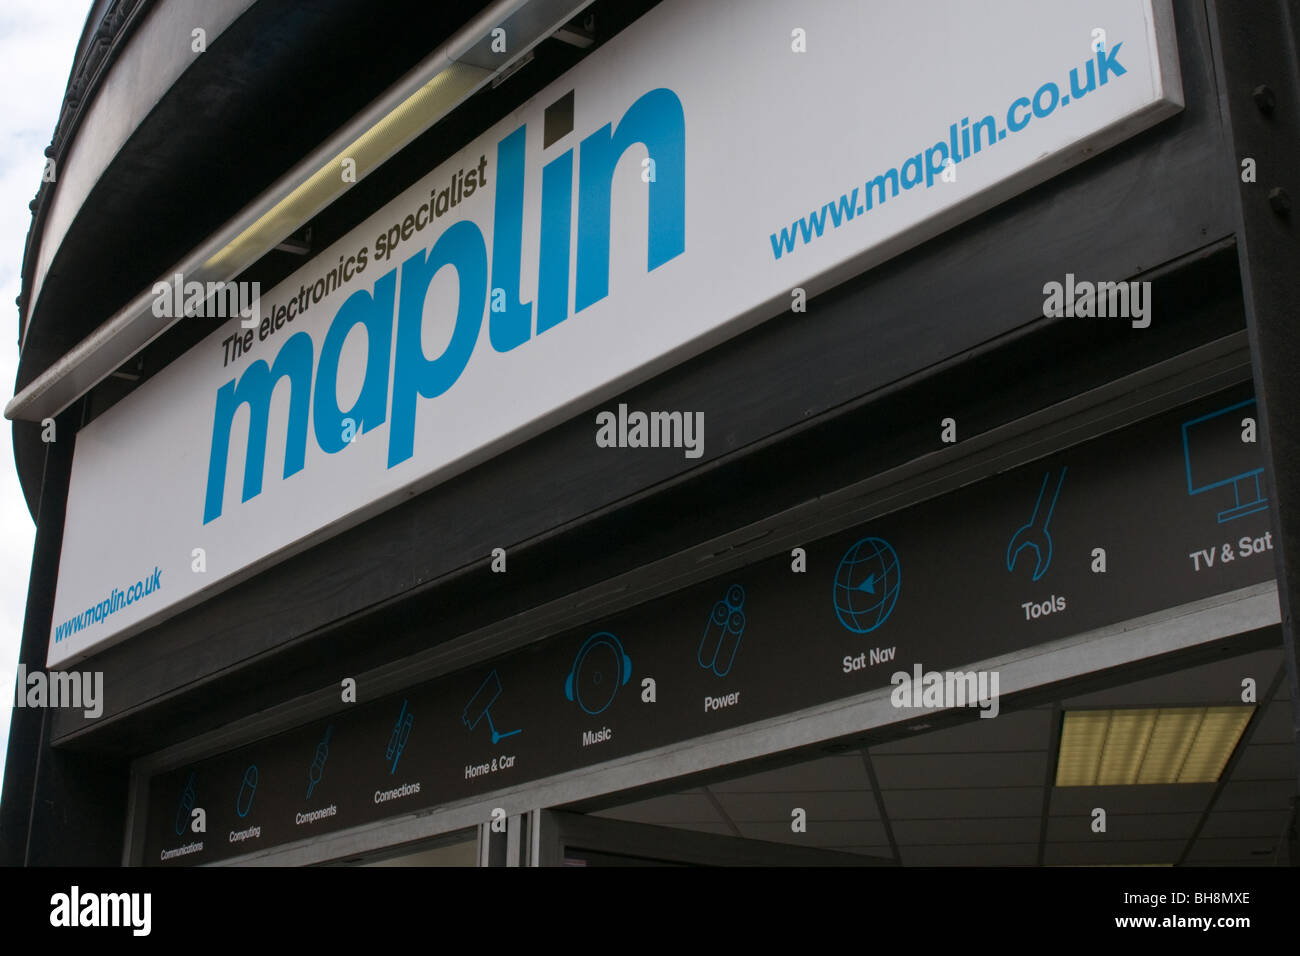 Maplin High Street shop sign - Stock Image